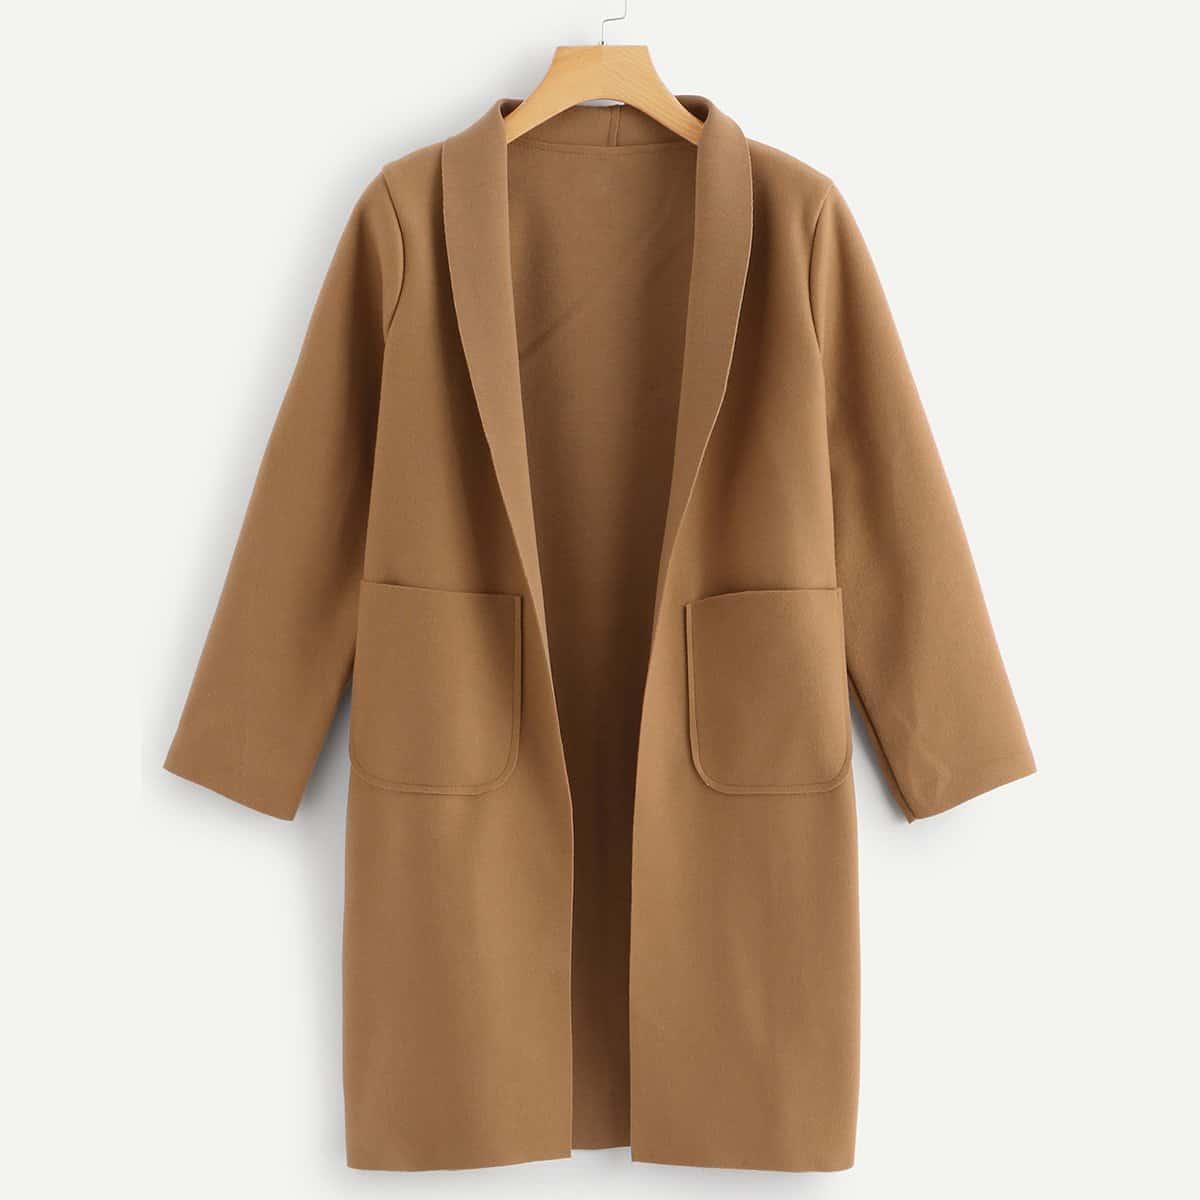 Shawl Collar Dual Pockets Overcoat